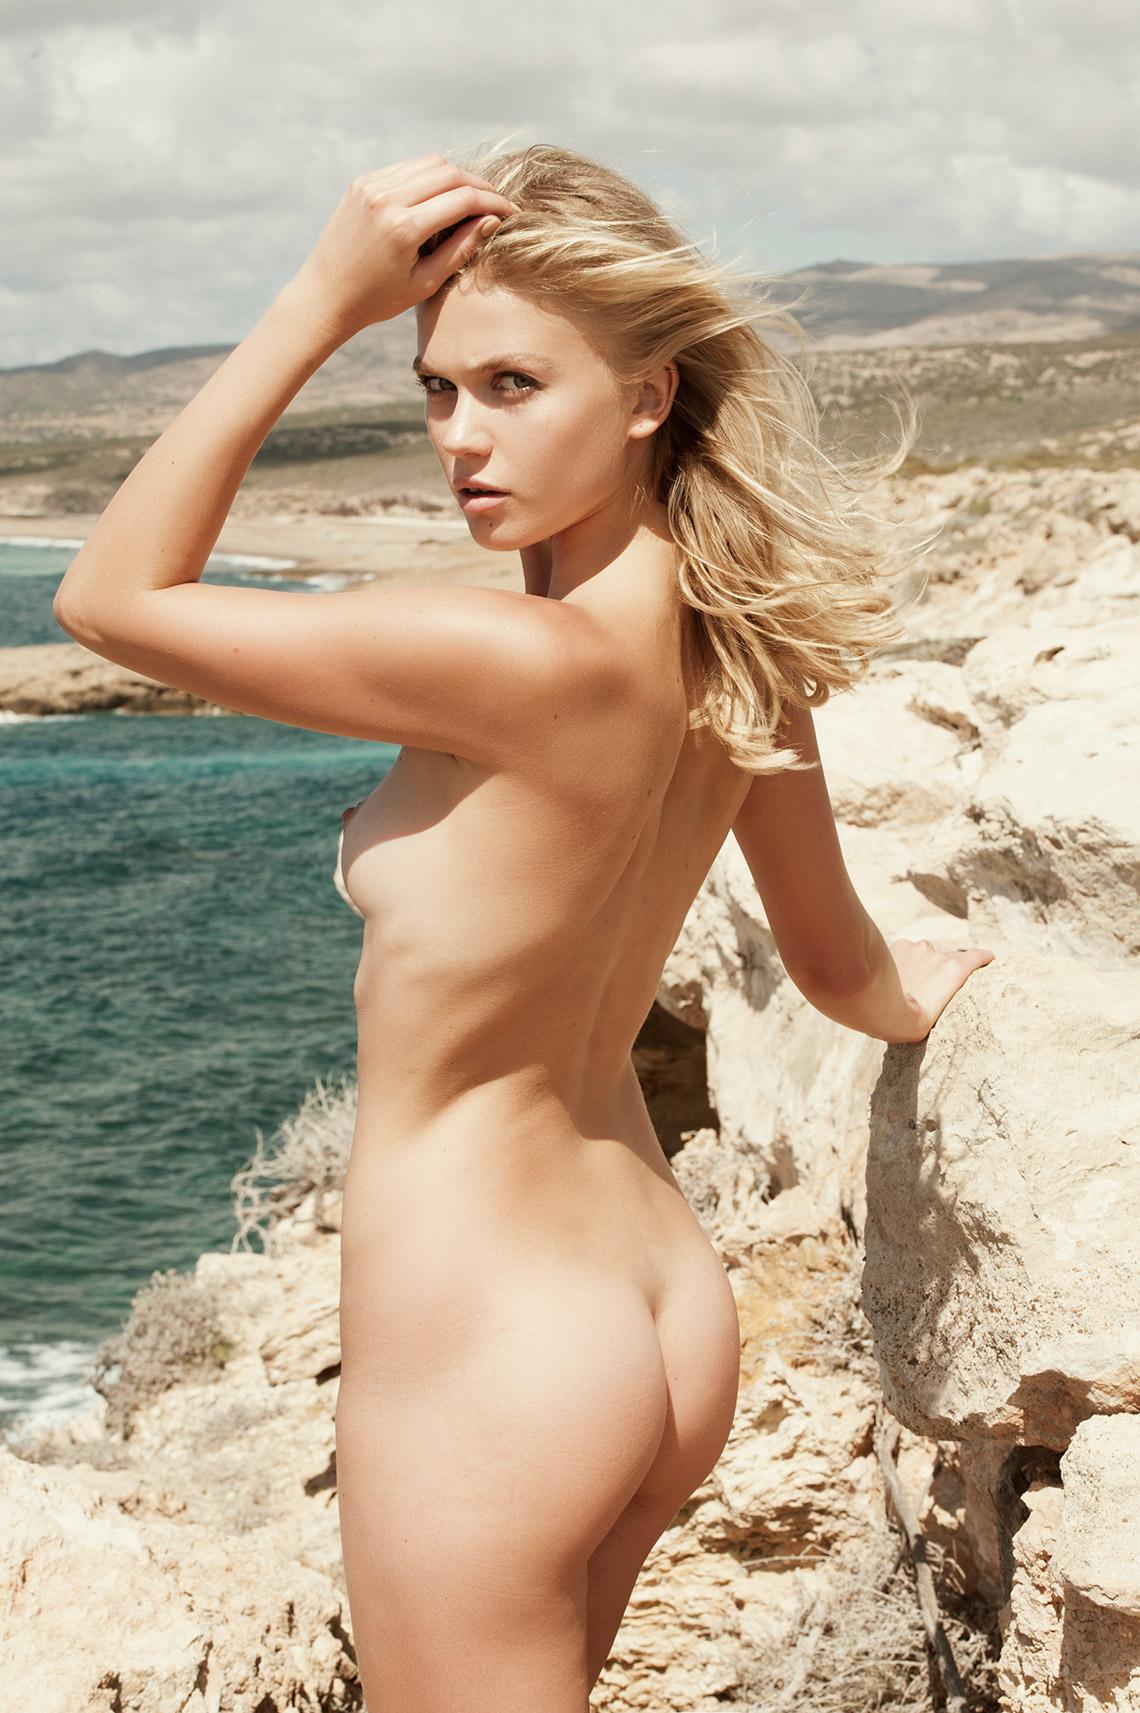 Adrian disney girl nude